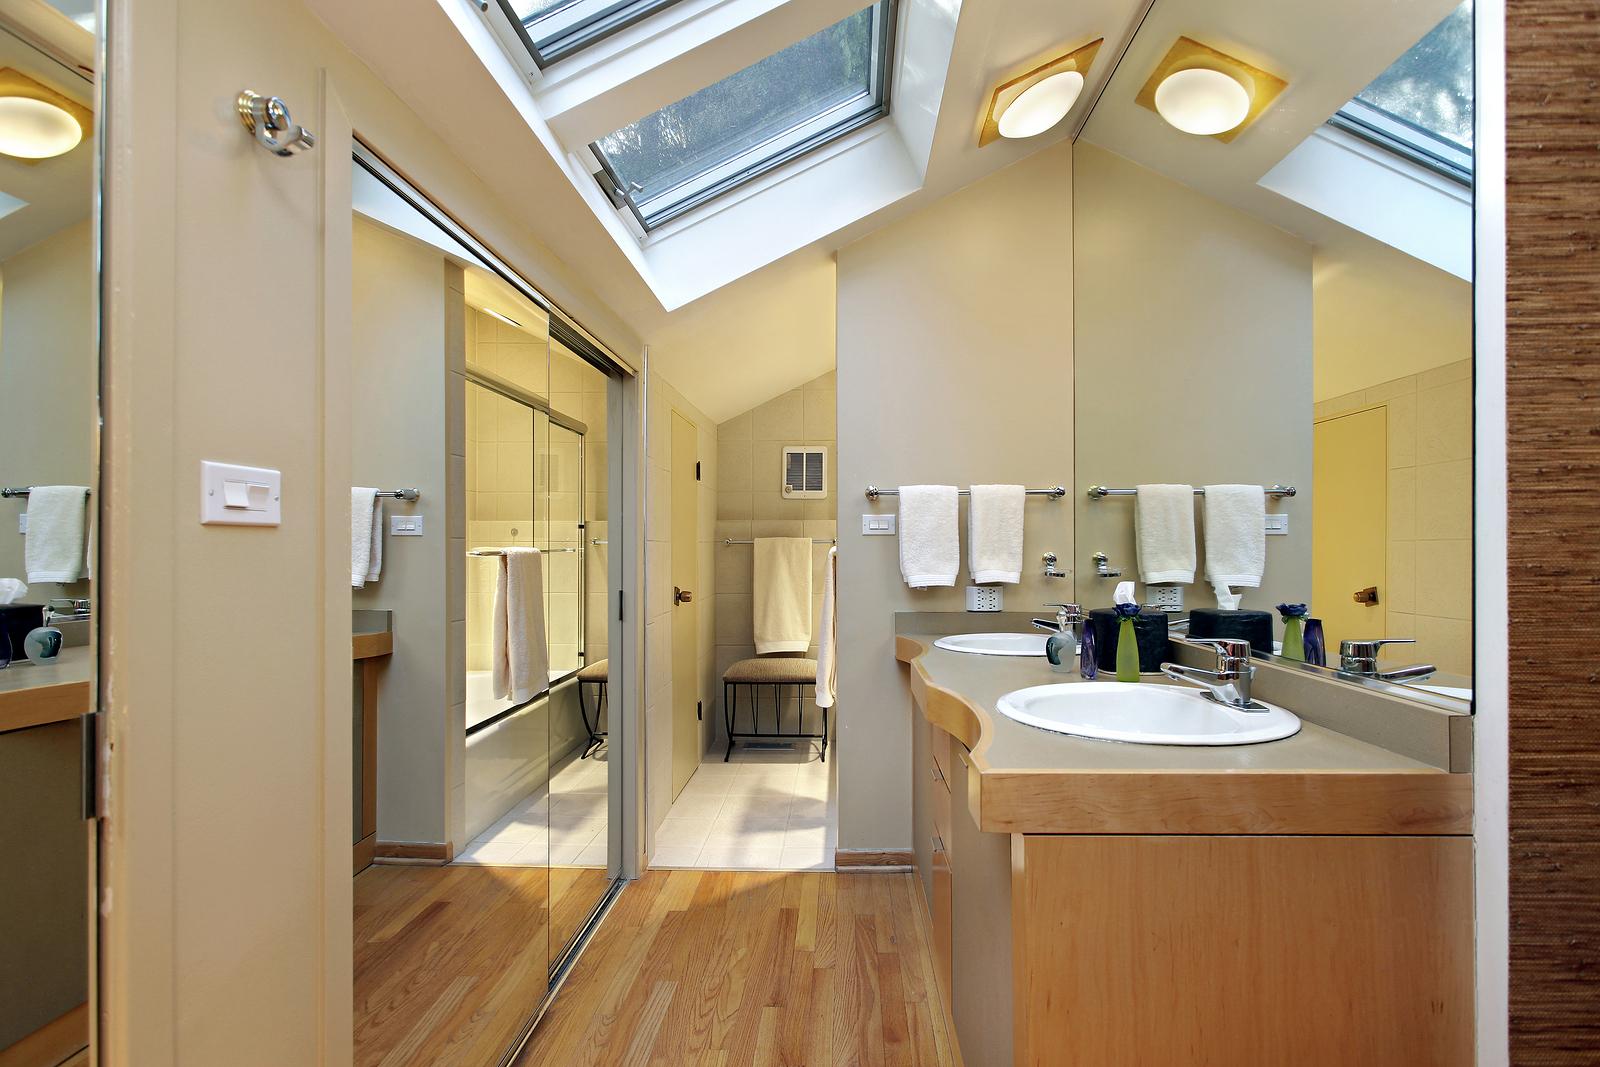 bigstock-Master-bath-in-suburban-home-w-22837157